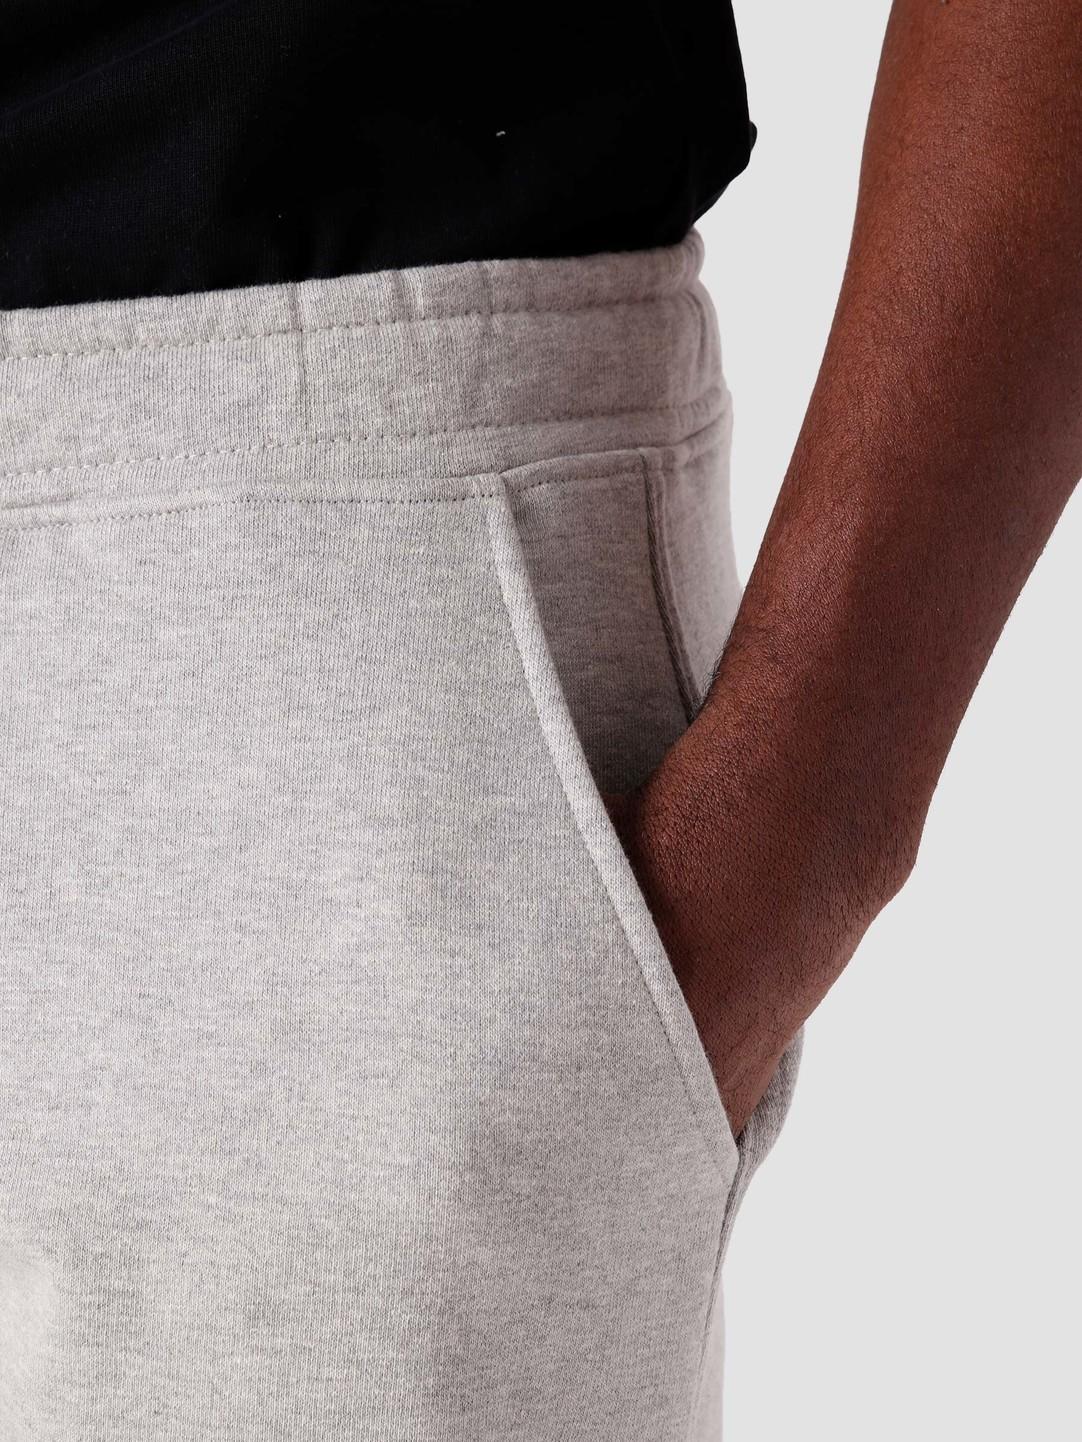 Quality Blanks Quality Blanks QB30 Sweat Short Grey